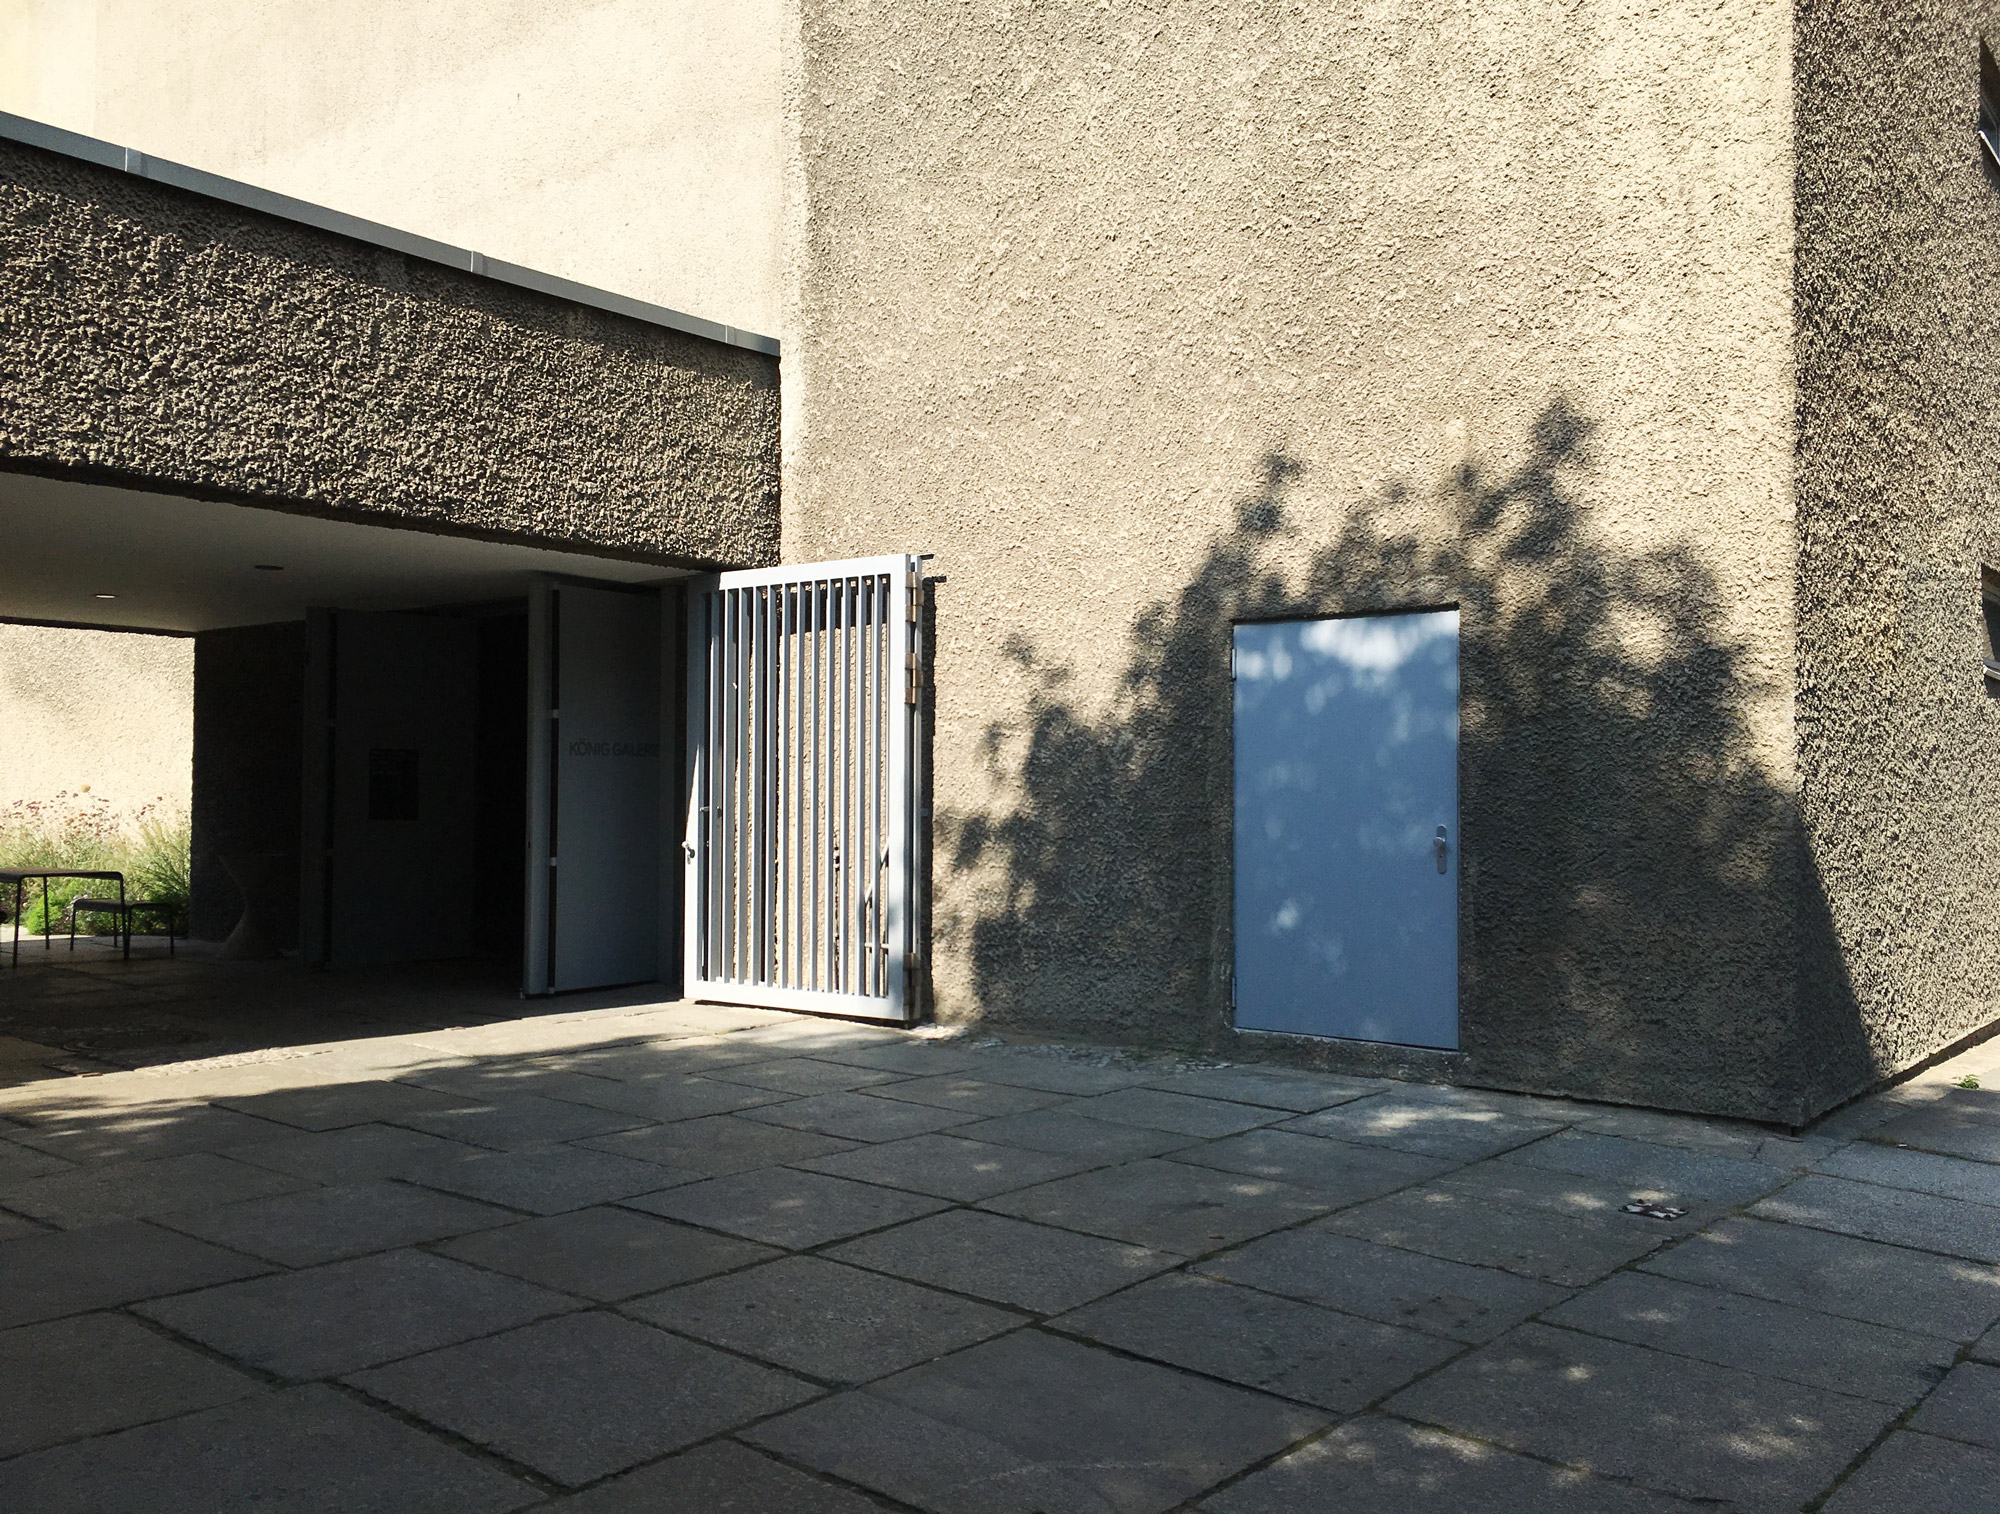 urbanbacklog-berlin-st-agnes-church-3.jpg